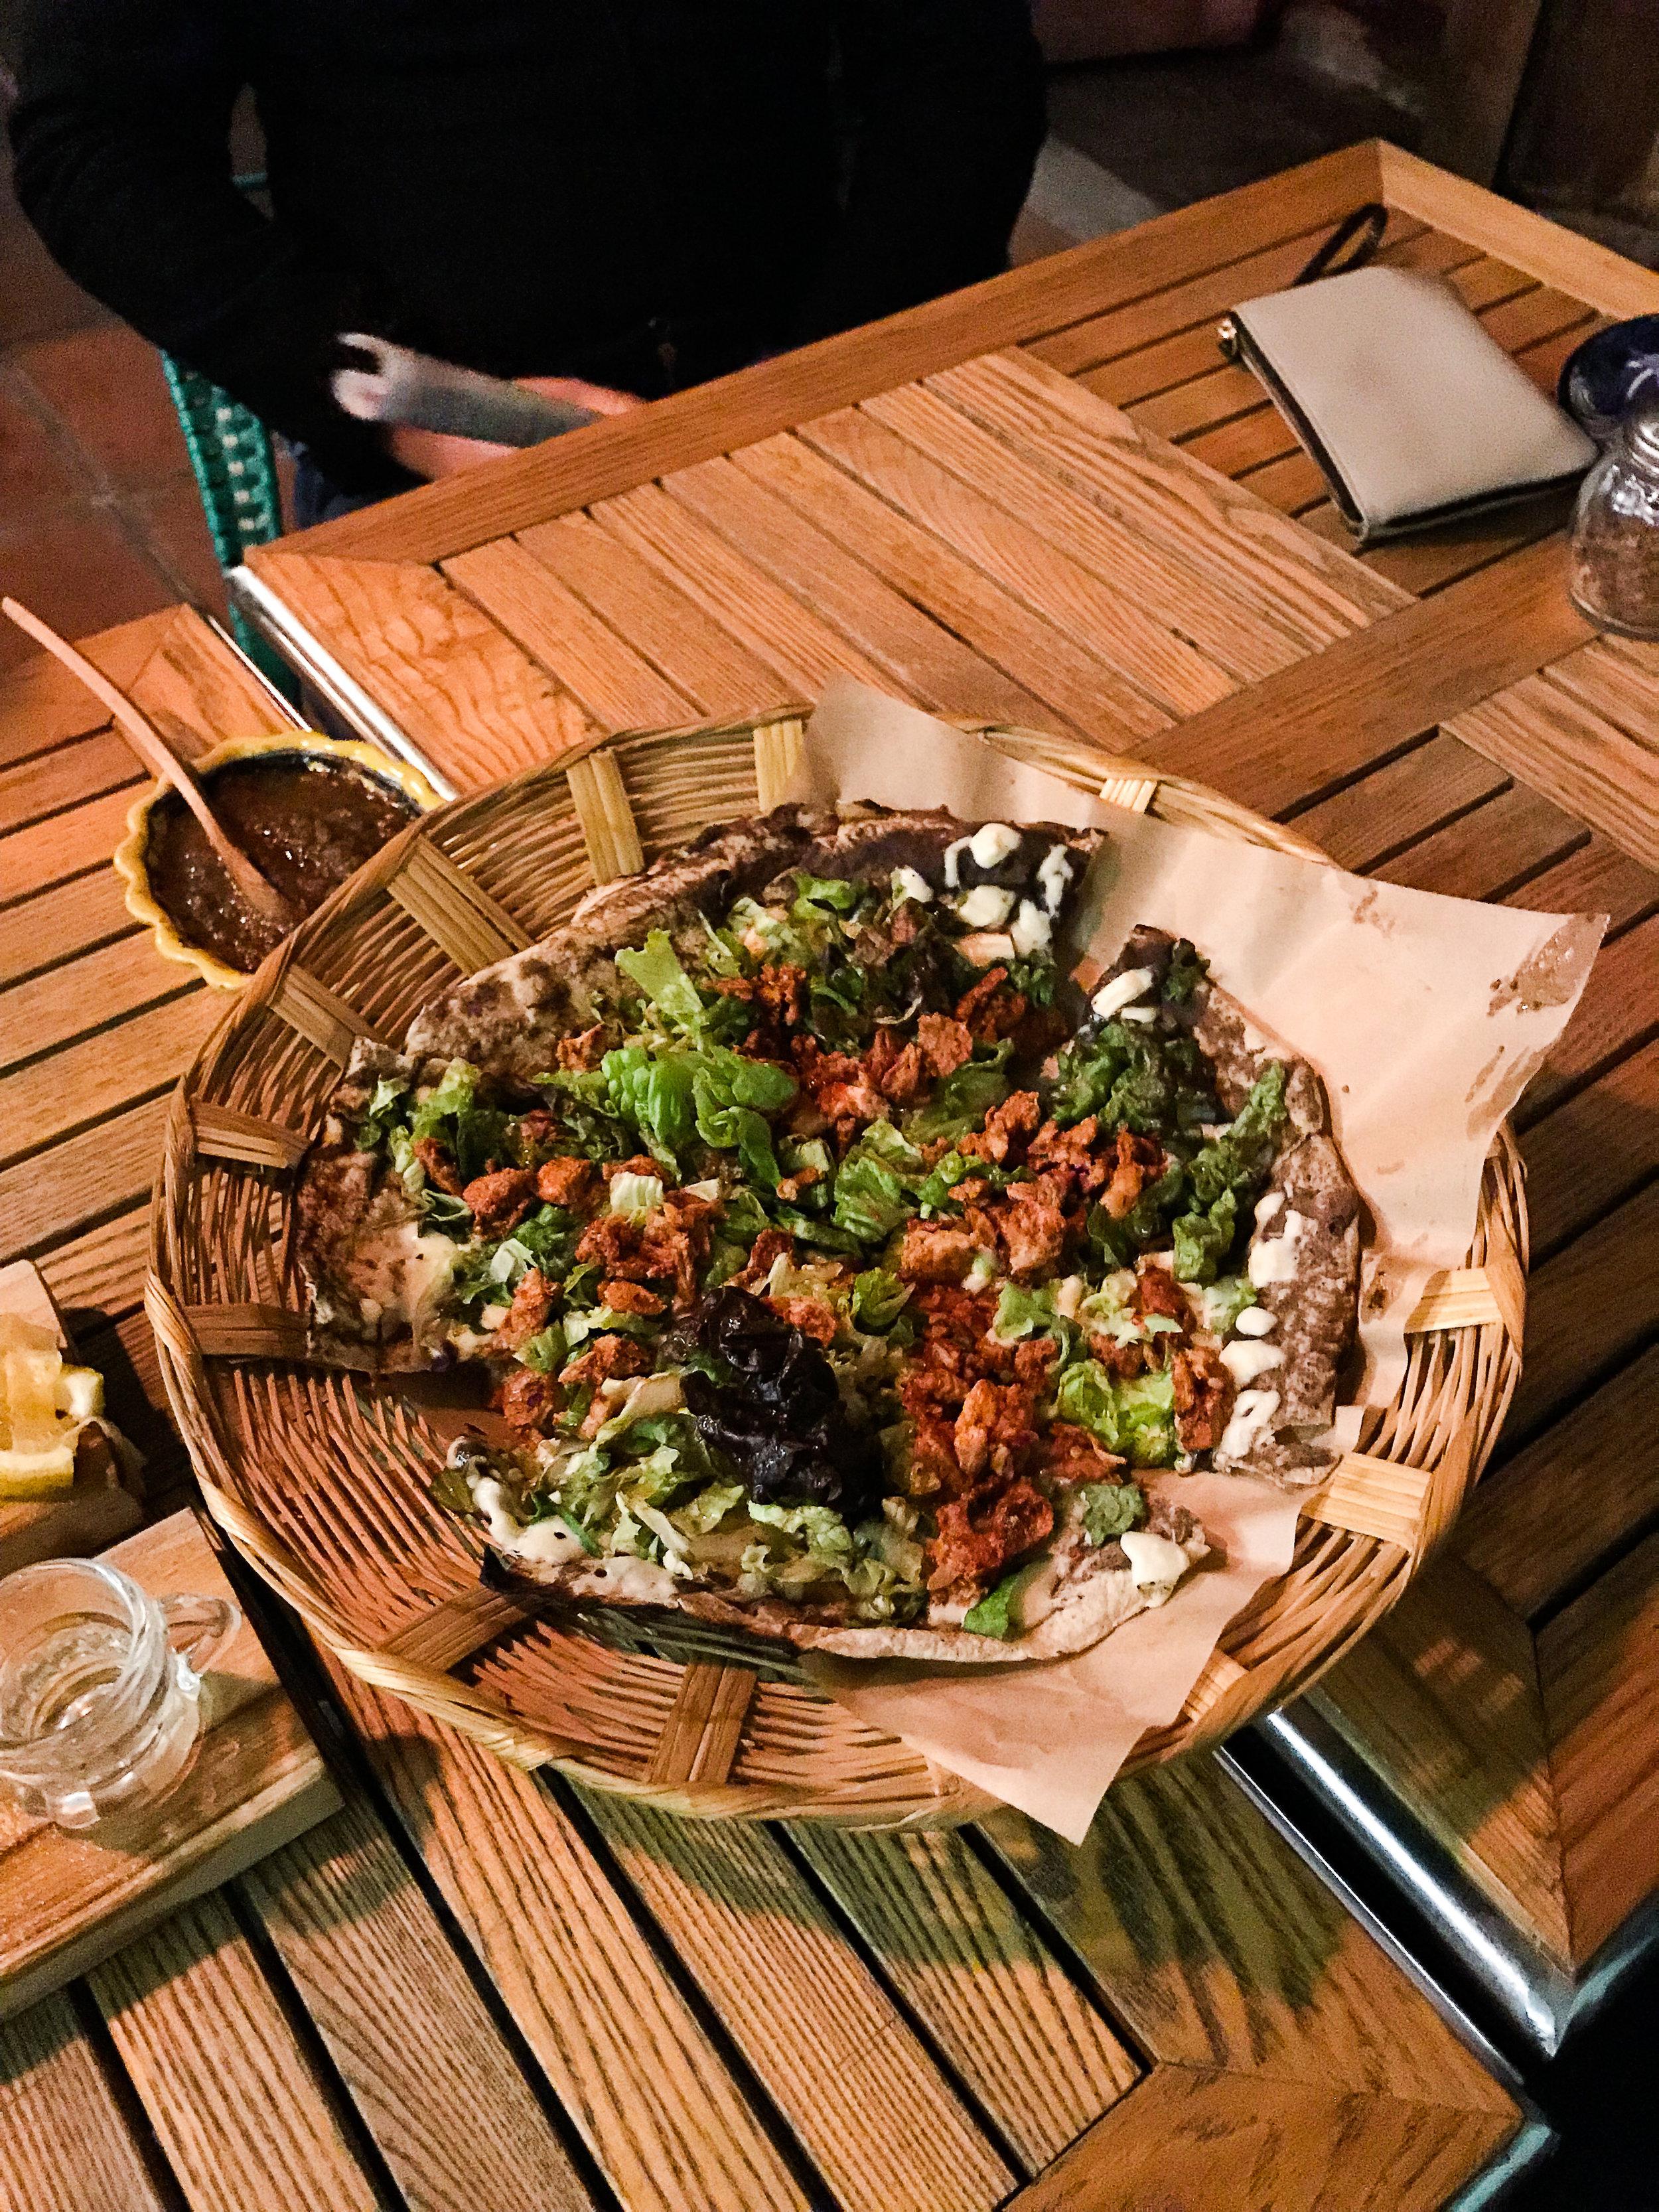 mexican-food-san-miguel-de-allende-restuarants-coffee-cafes-14.jpg